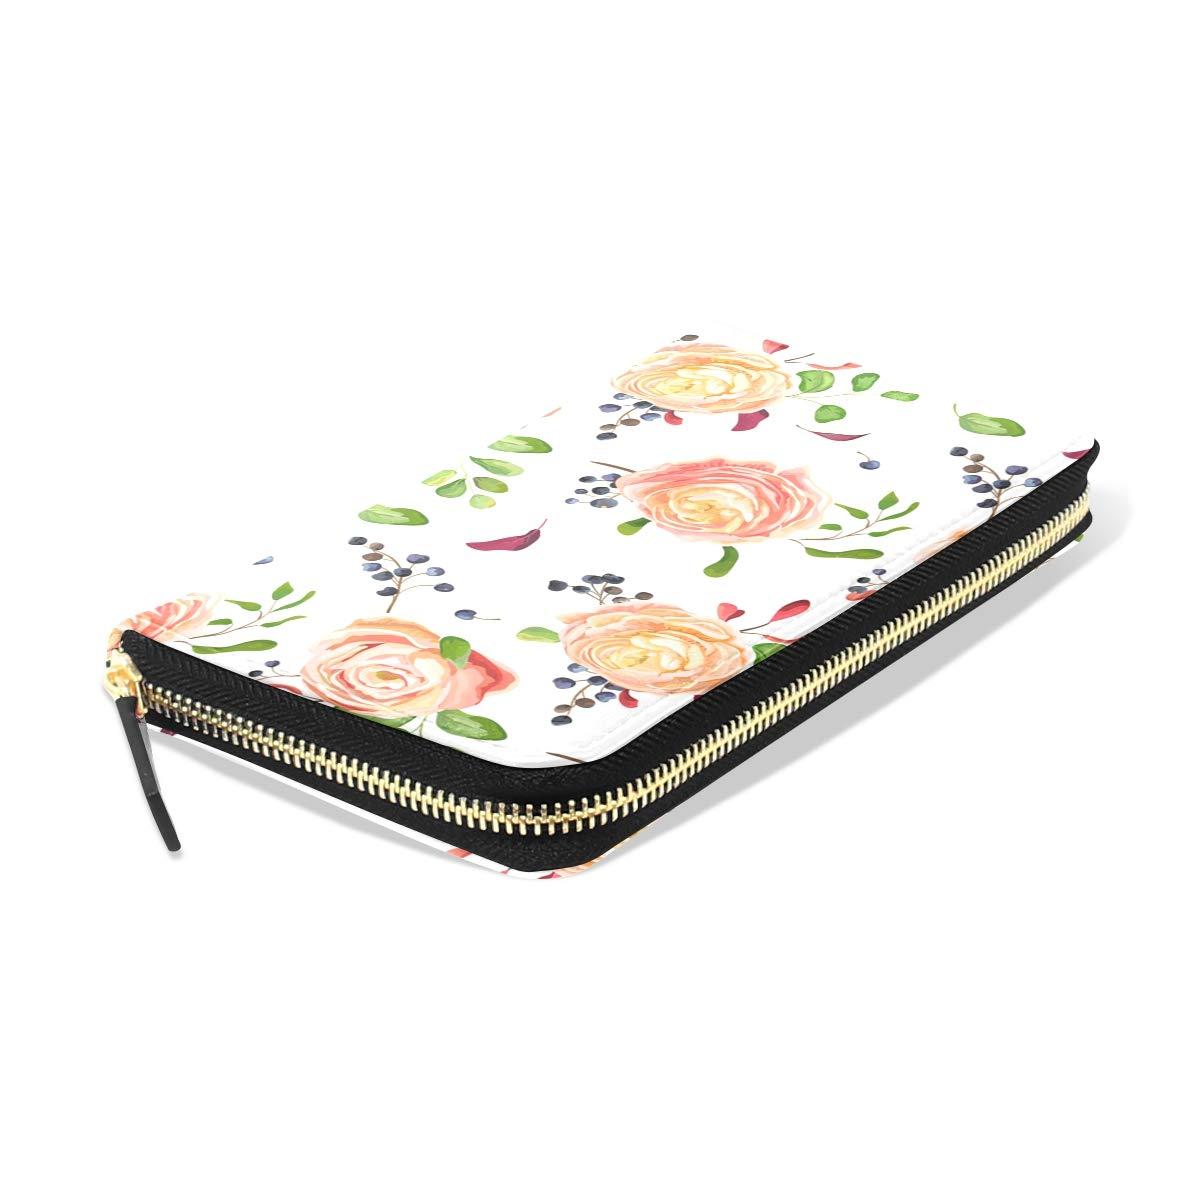 Women Pink Rose Ranunculus Leather Wallet Large Capacity Zipper Travel Wristlet Bags Clutch Cellphone Bag